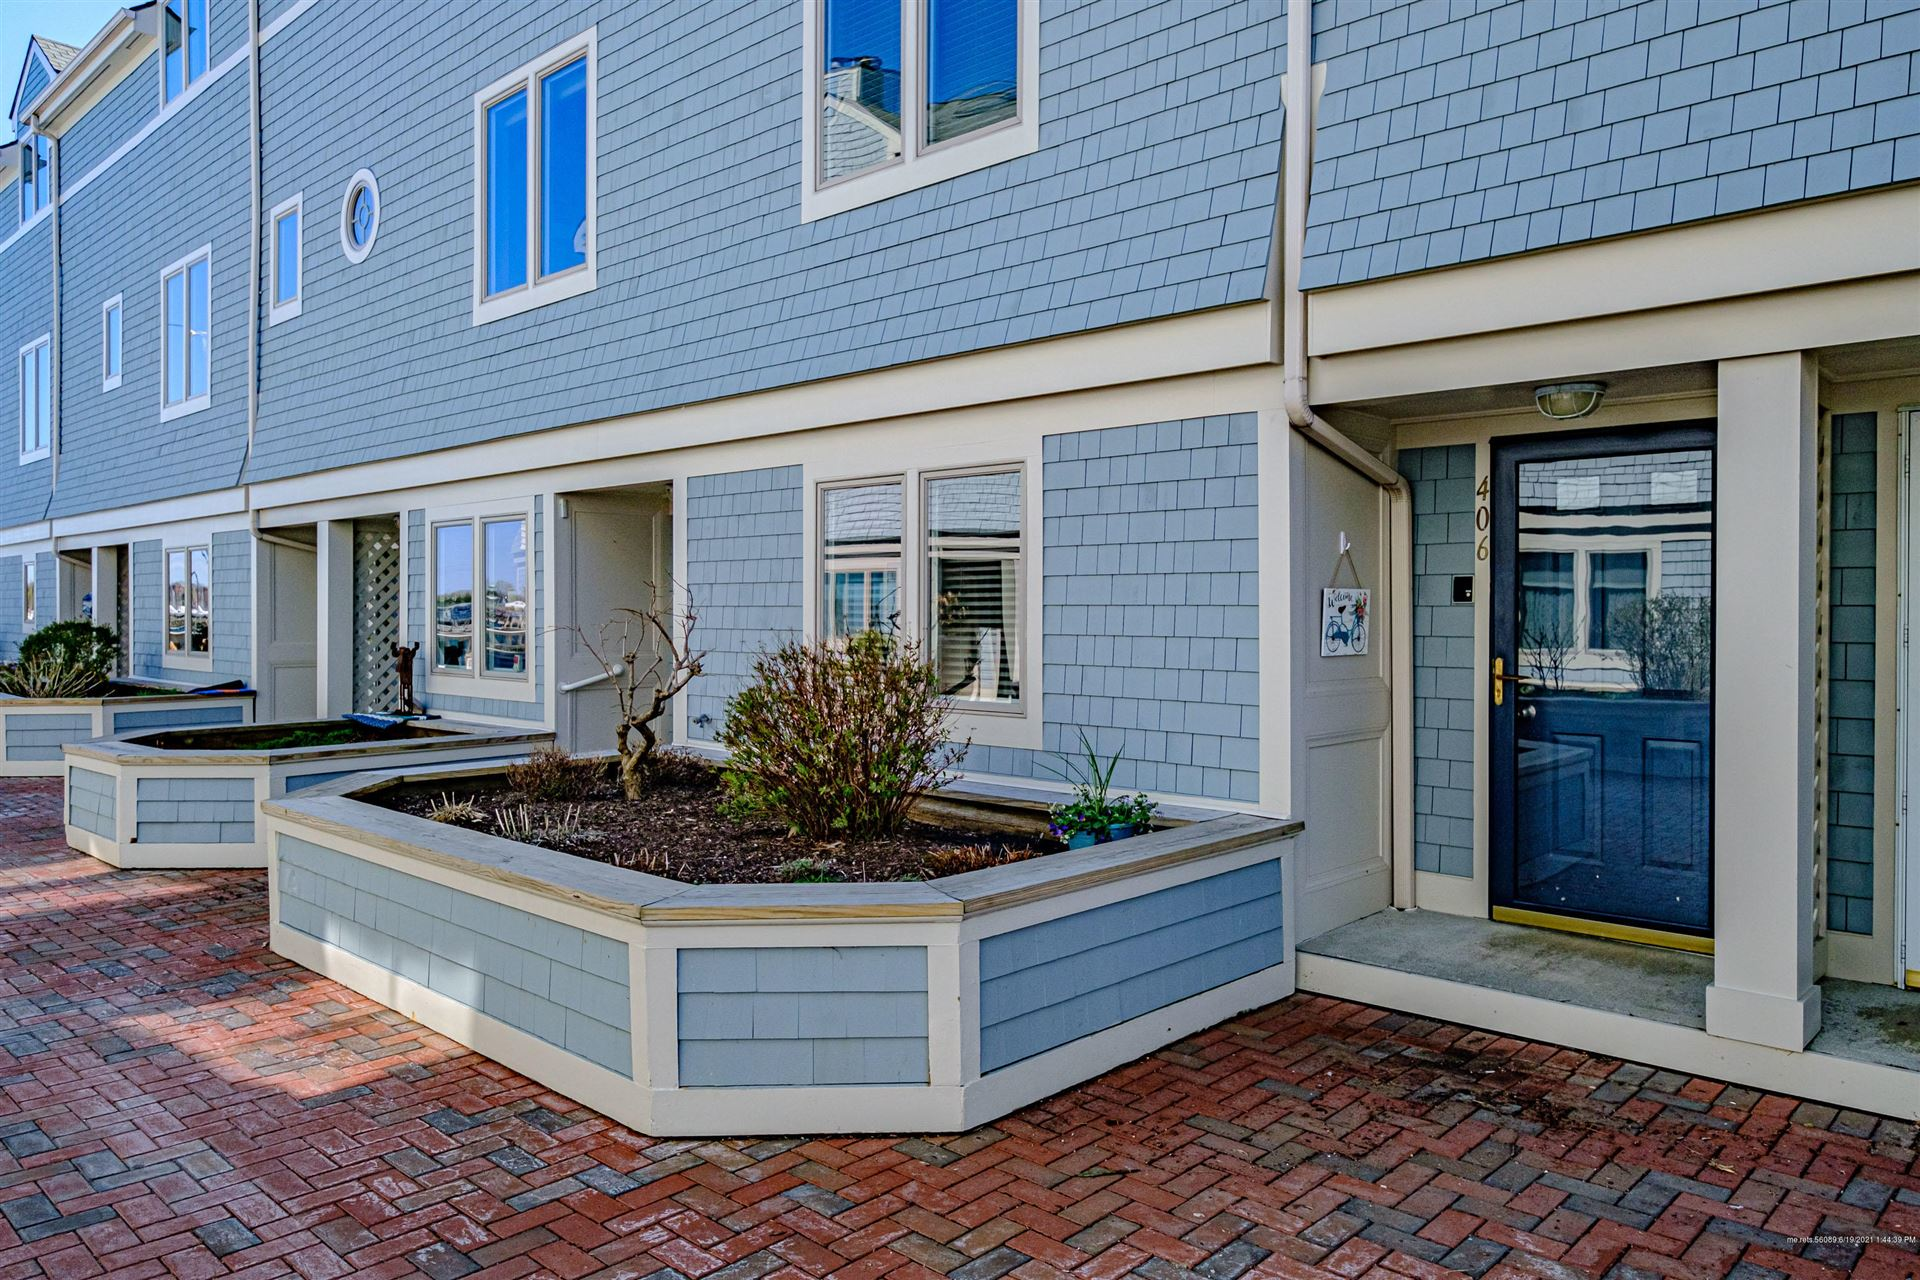 Photo of 406 Chandlers Wharf #406, Portland, ME 04101 (MLS # 1497015)